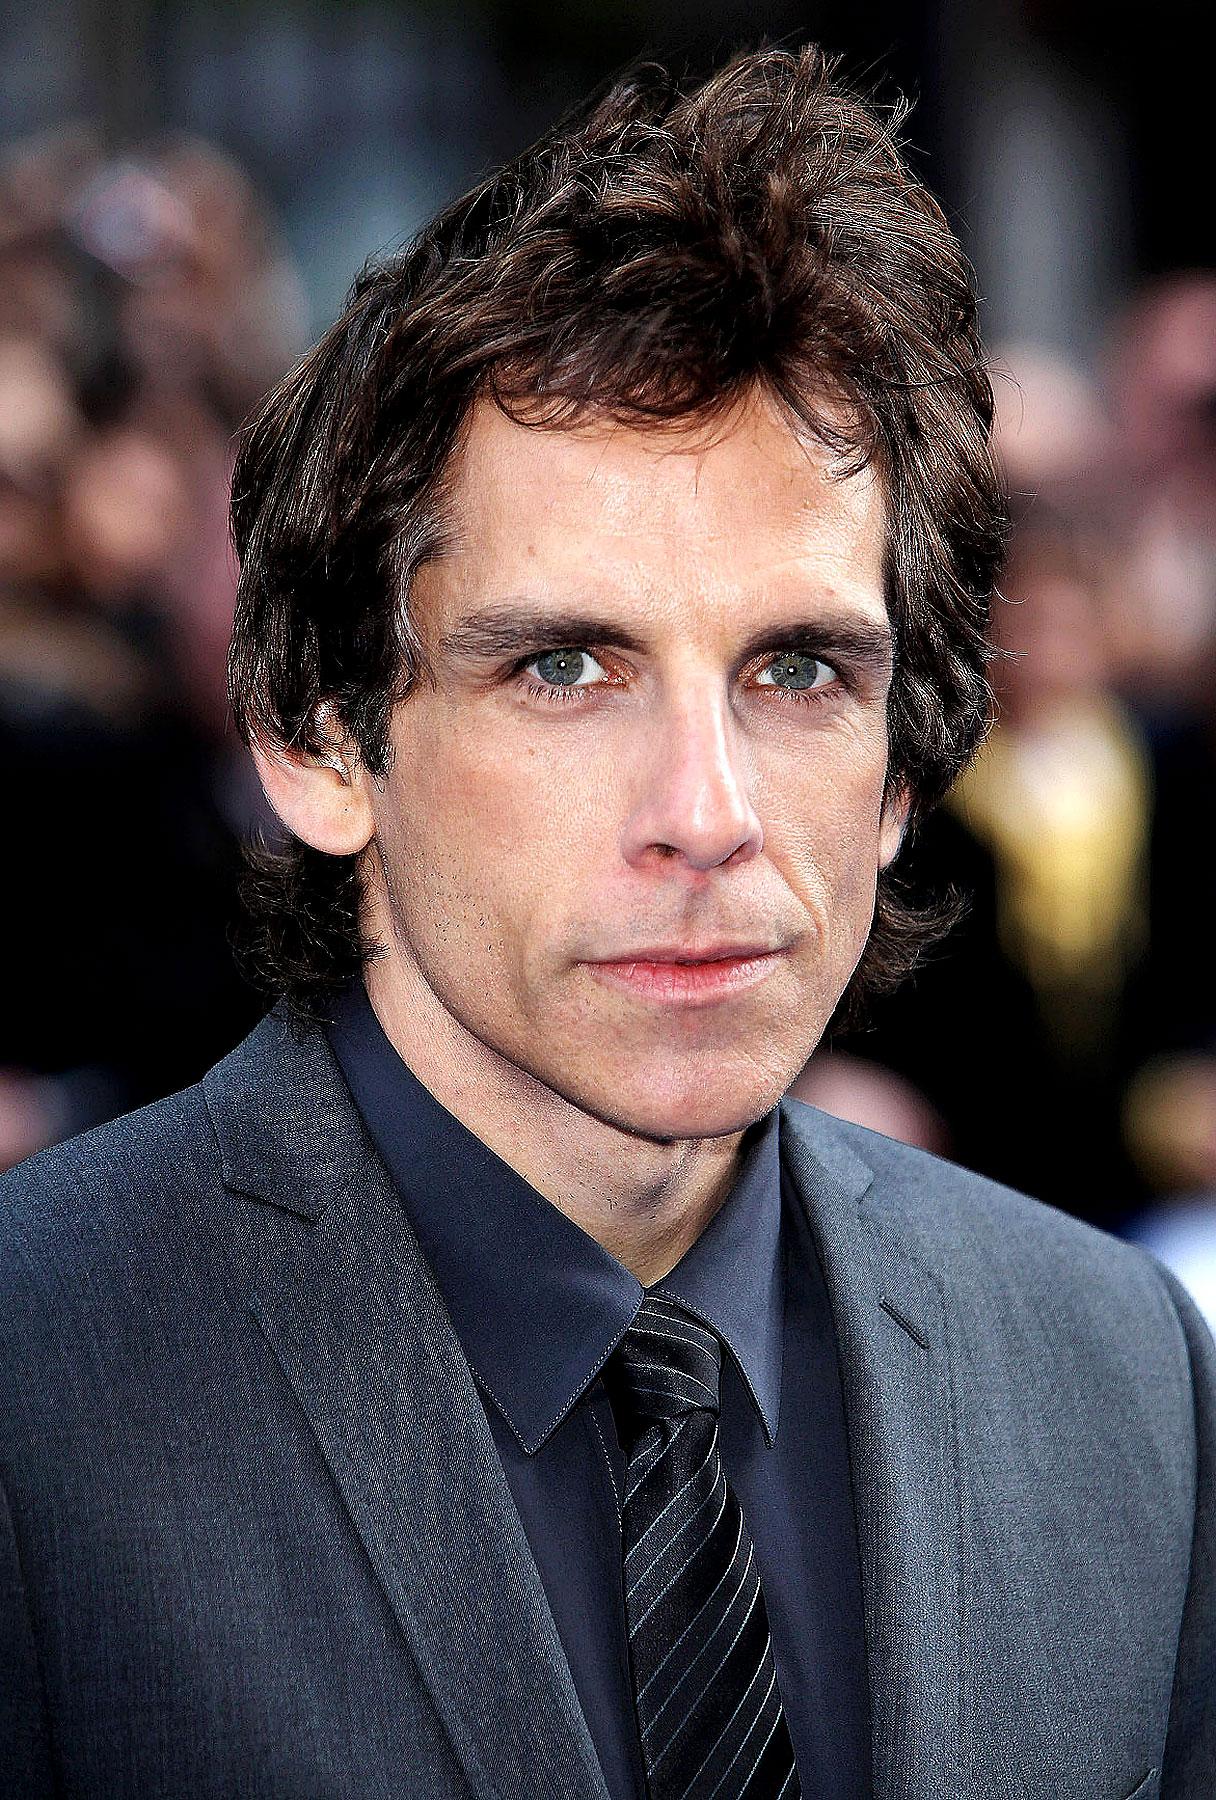 VIDEO: Ben Stiller Talks 'Zoolander 2′